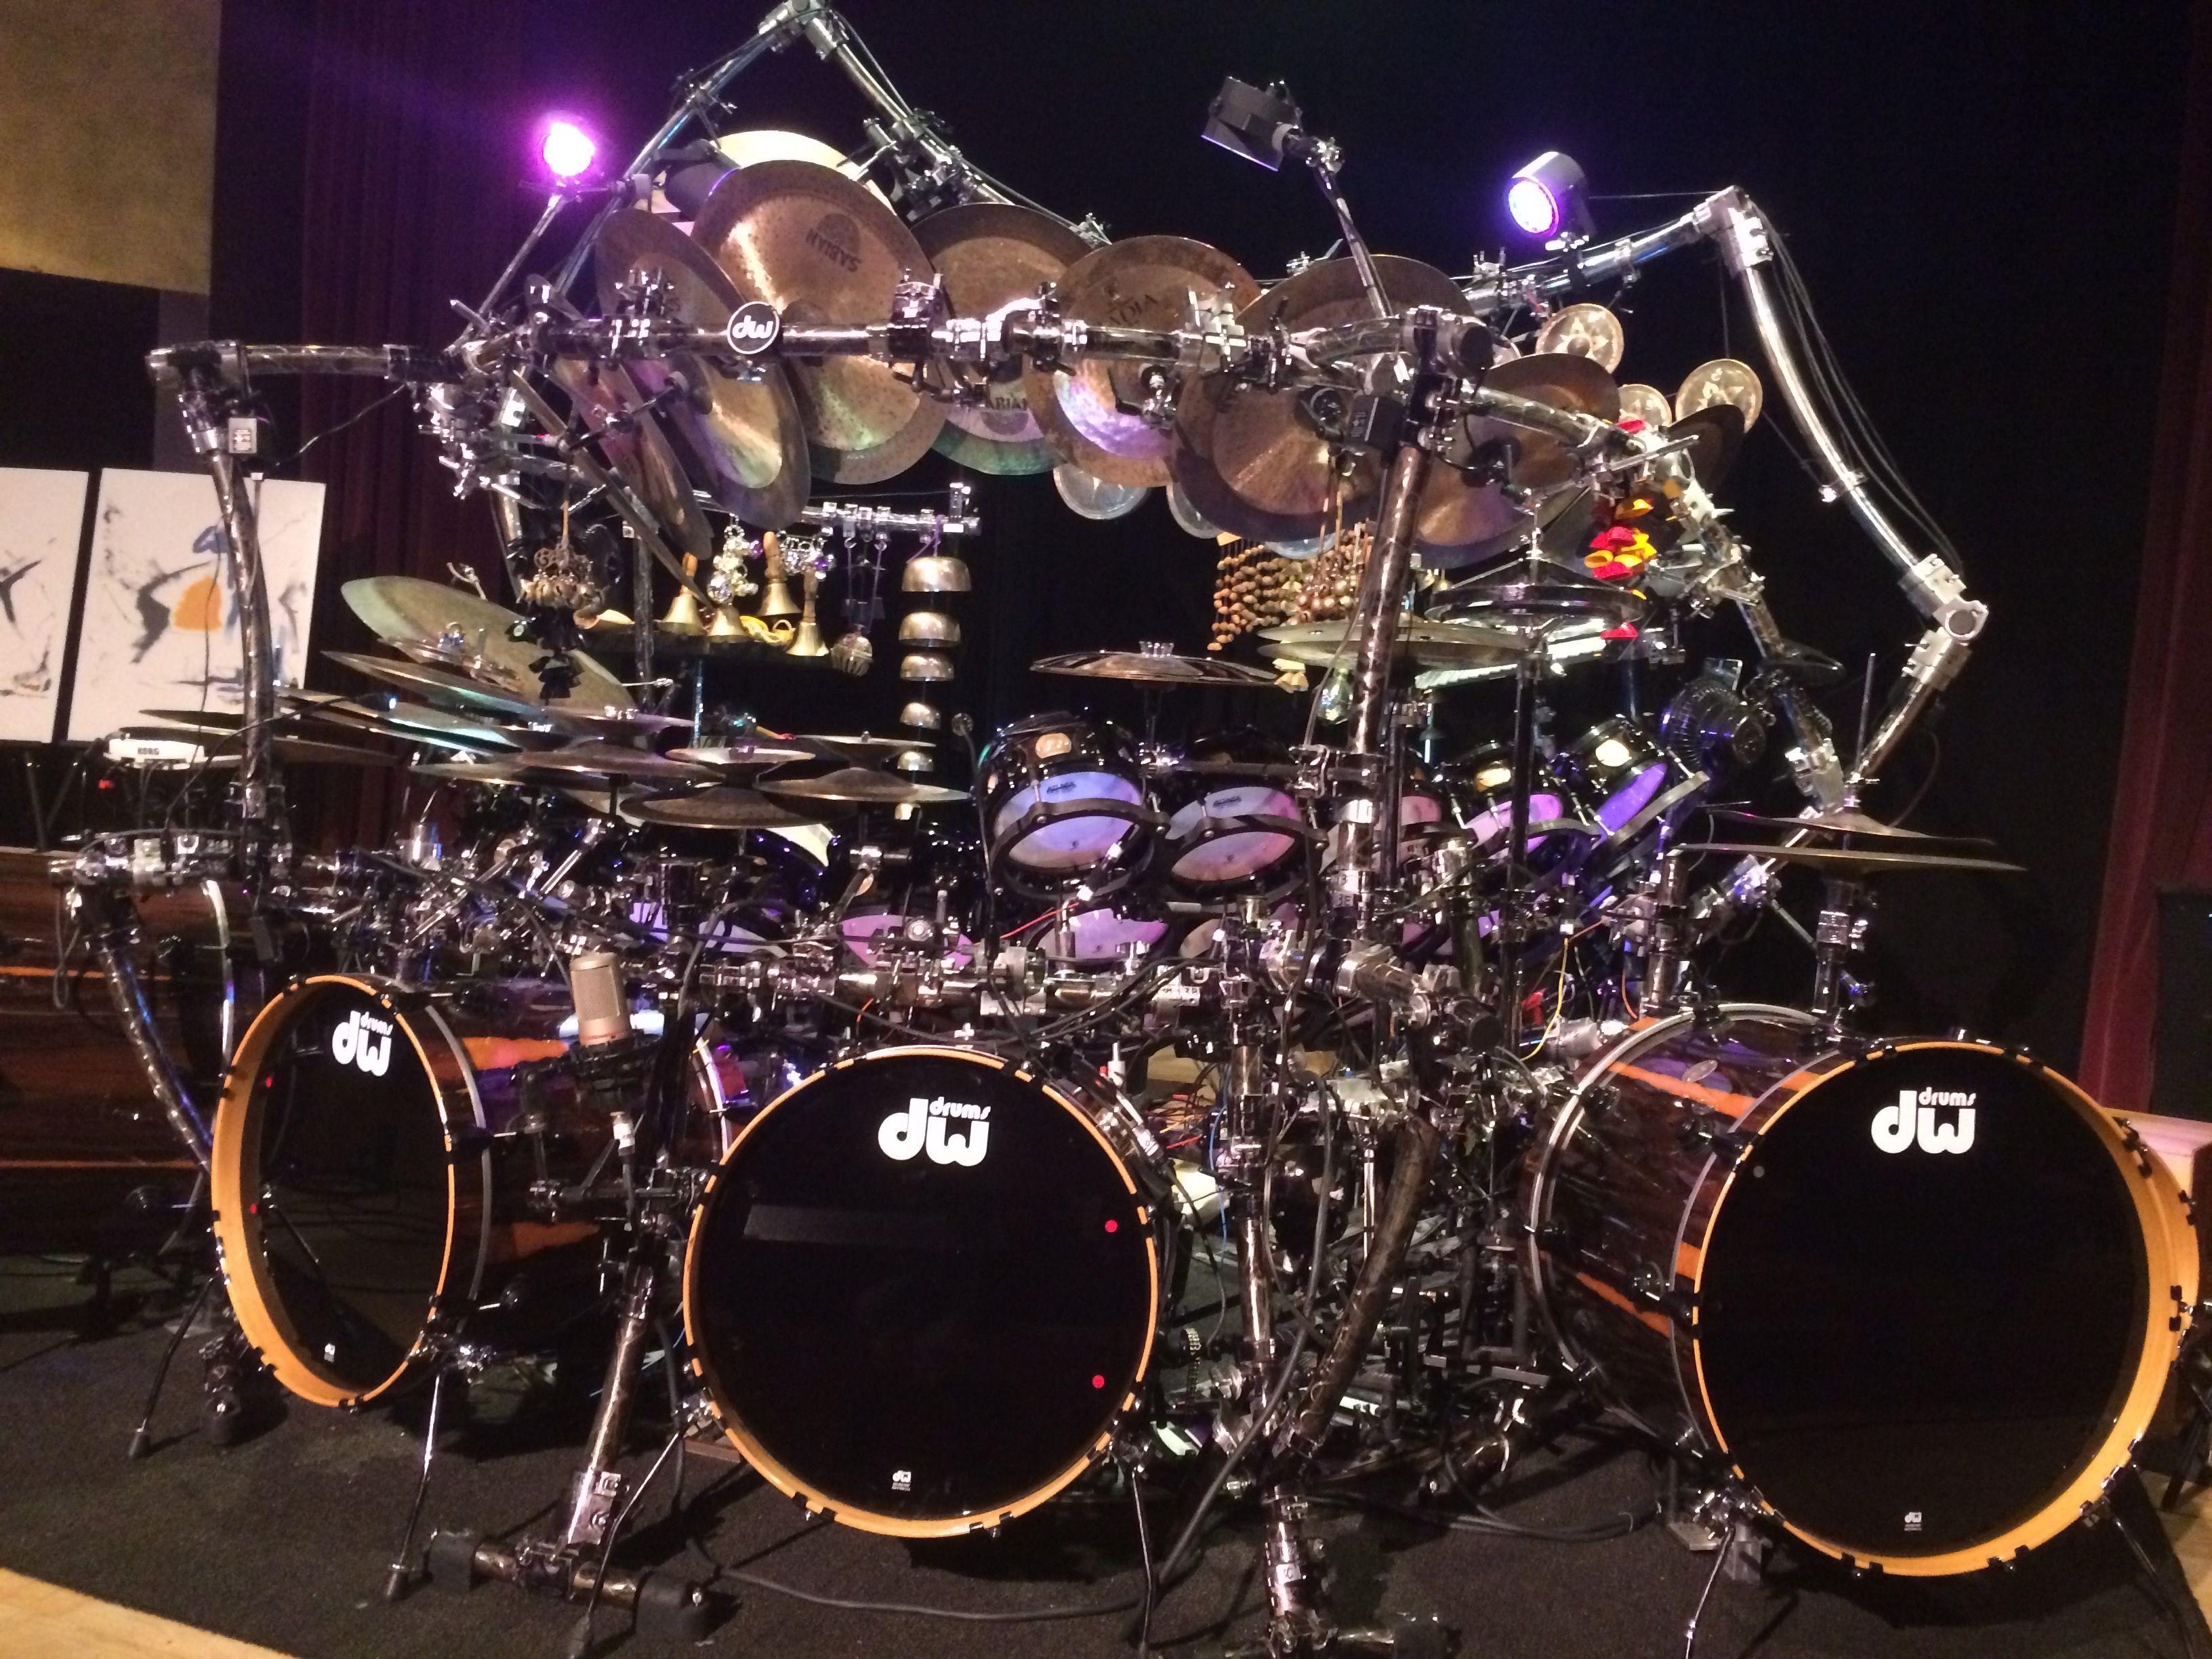 pin by mike kaluski on drums drum kits drums instruments. Black Bedroom Furniture Sets. Home Design Ideas